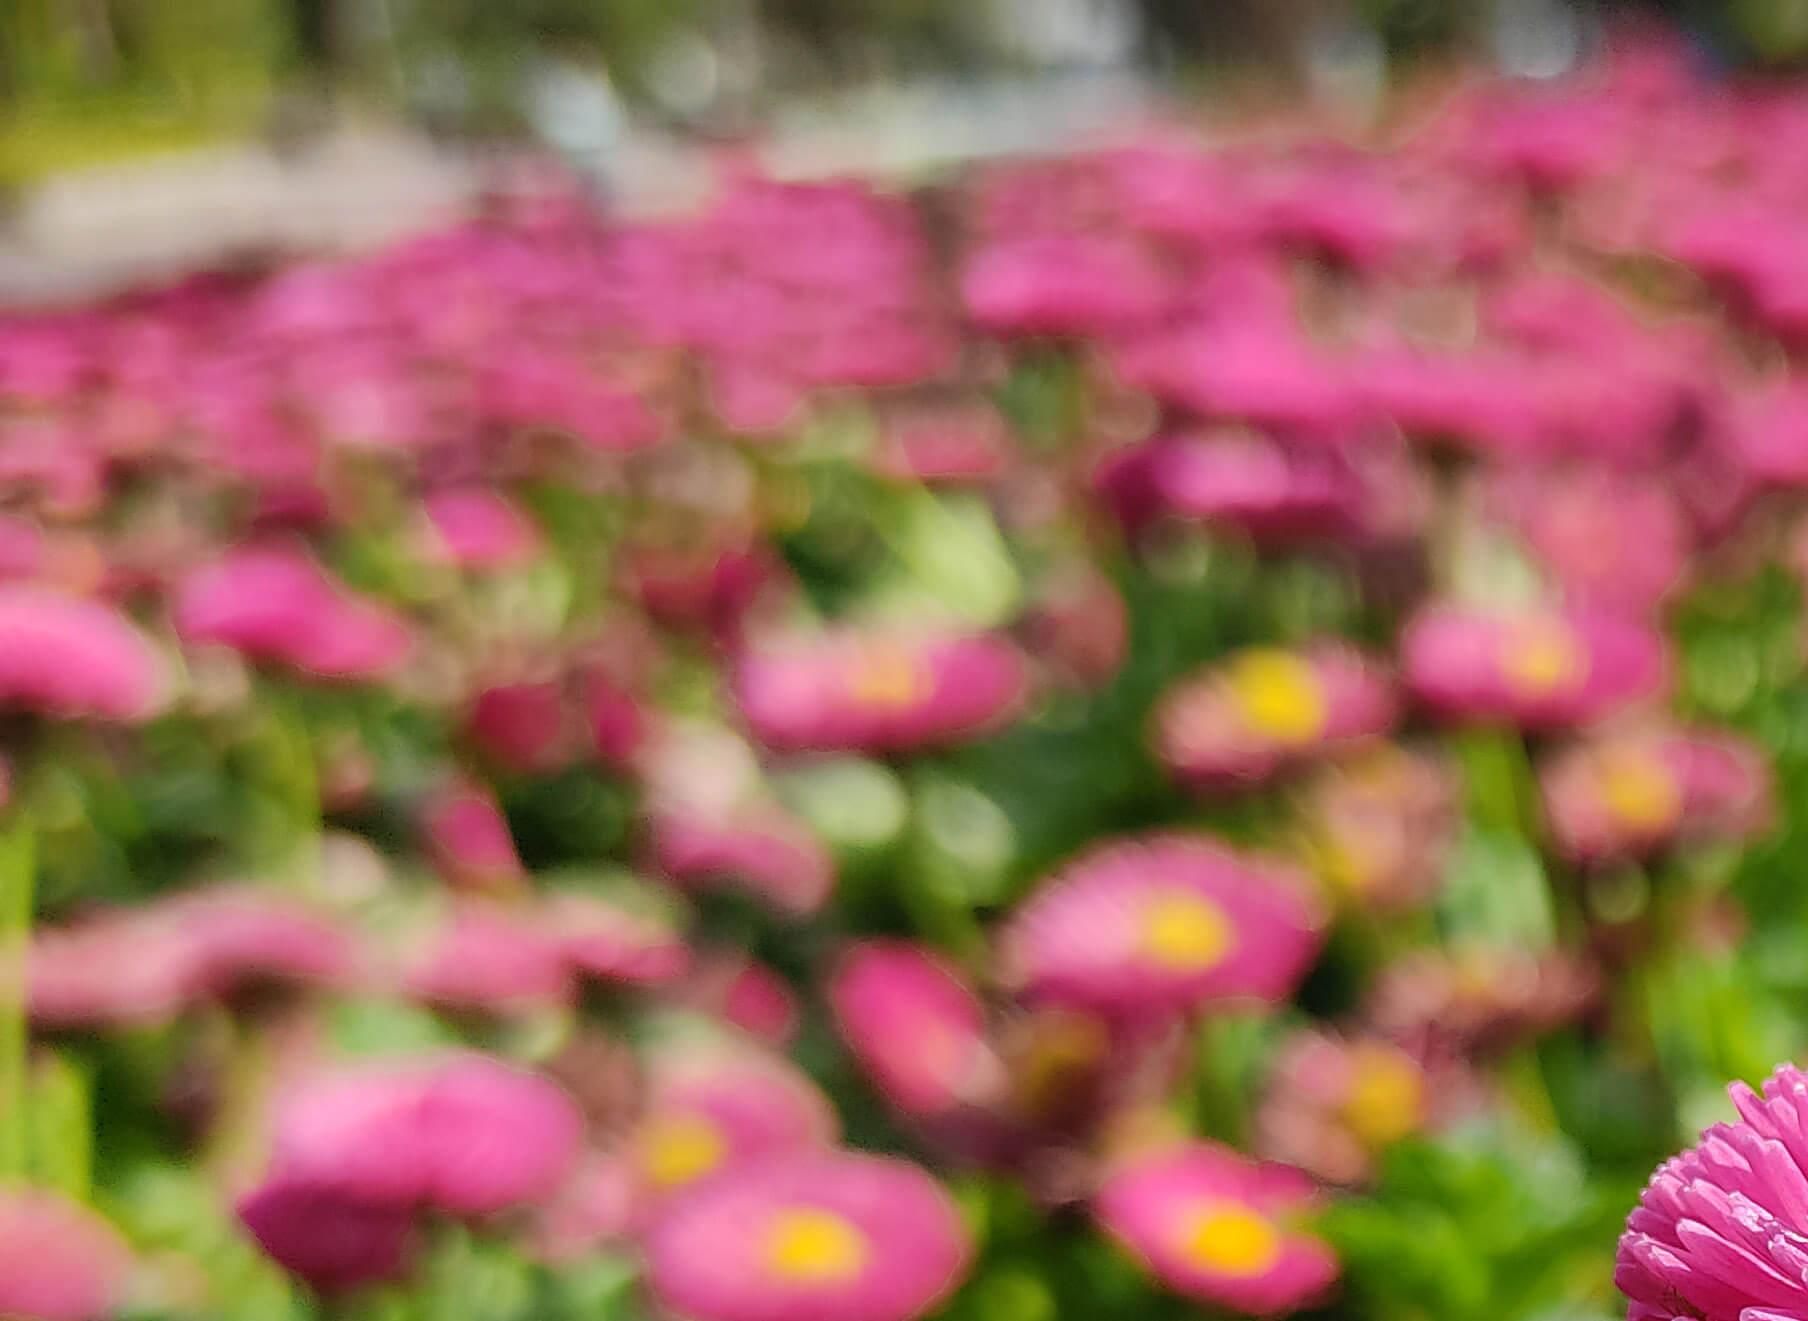 Redmi Note 9Sで撮影したピンクの花の画像を拡大